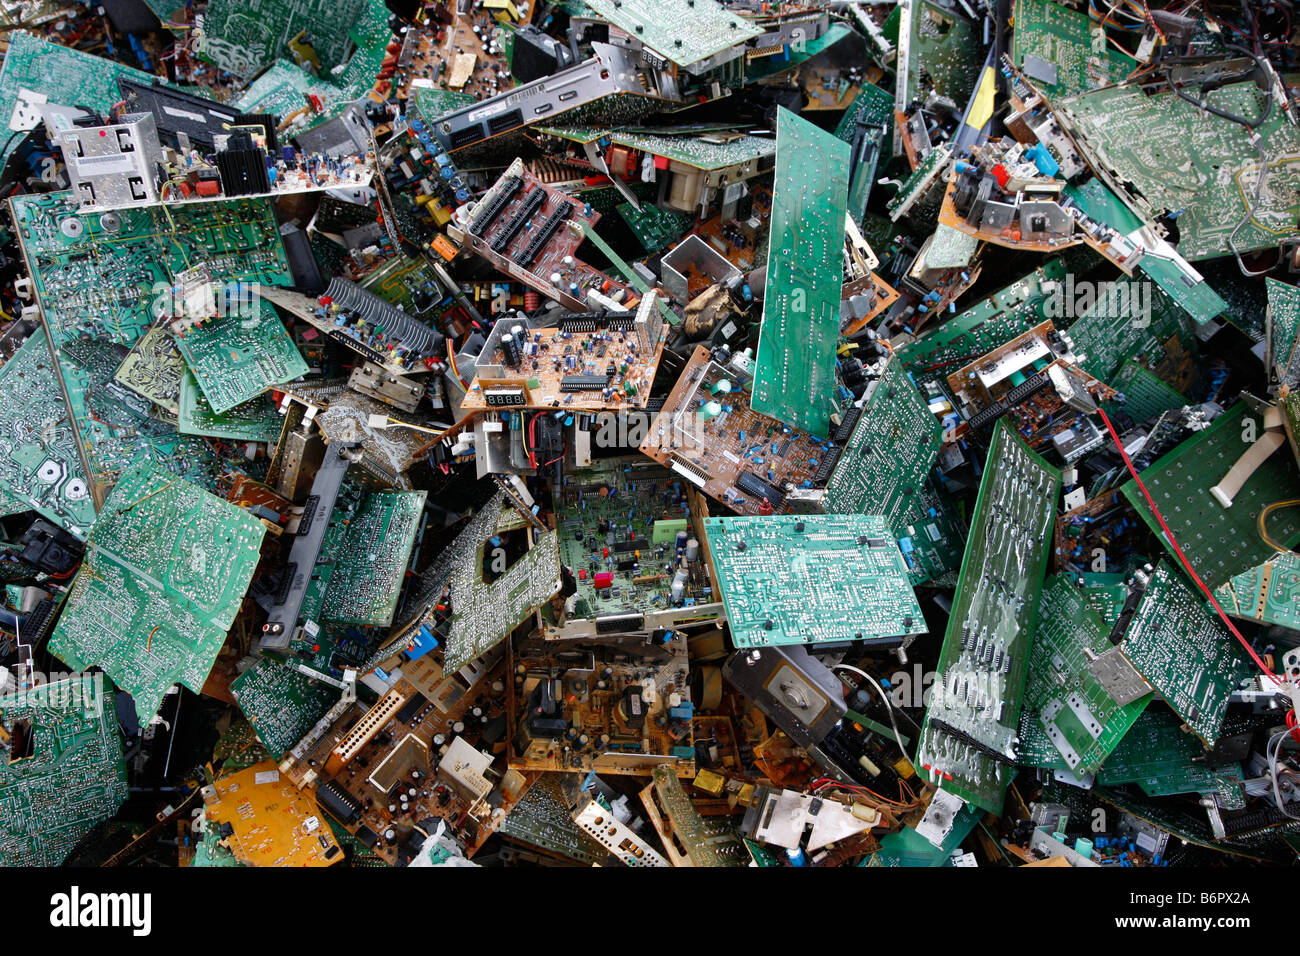 Elektronikschrott, gebraucht alt Computer-Teile für das recycling Stockbild